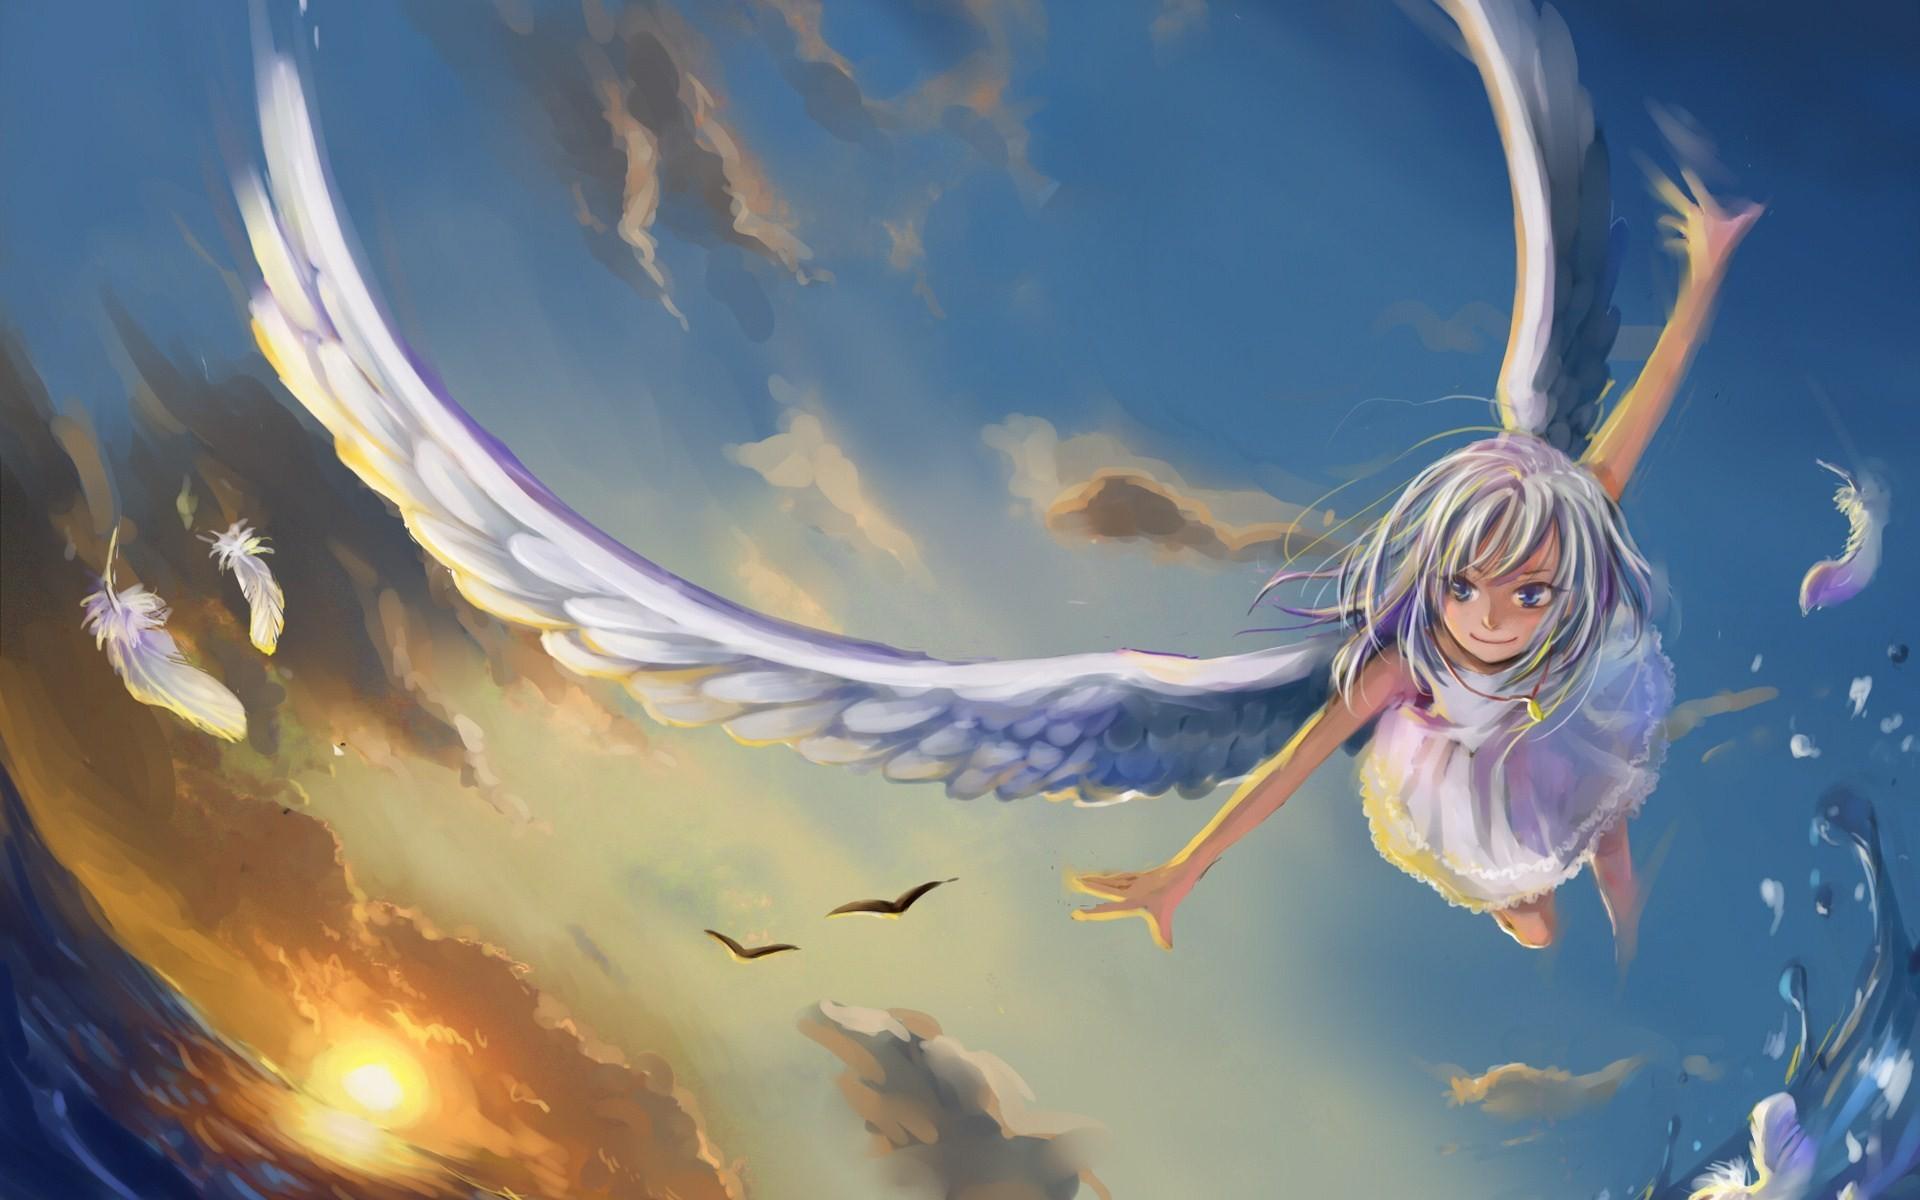 Fallen Angel Hd Wallpaper 70 Images